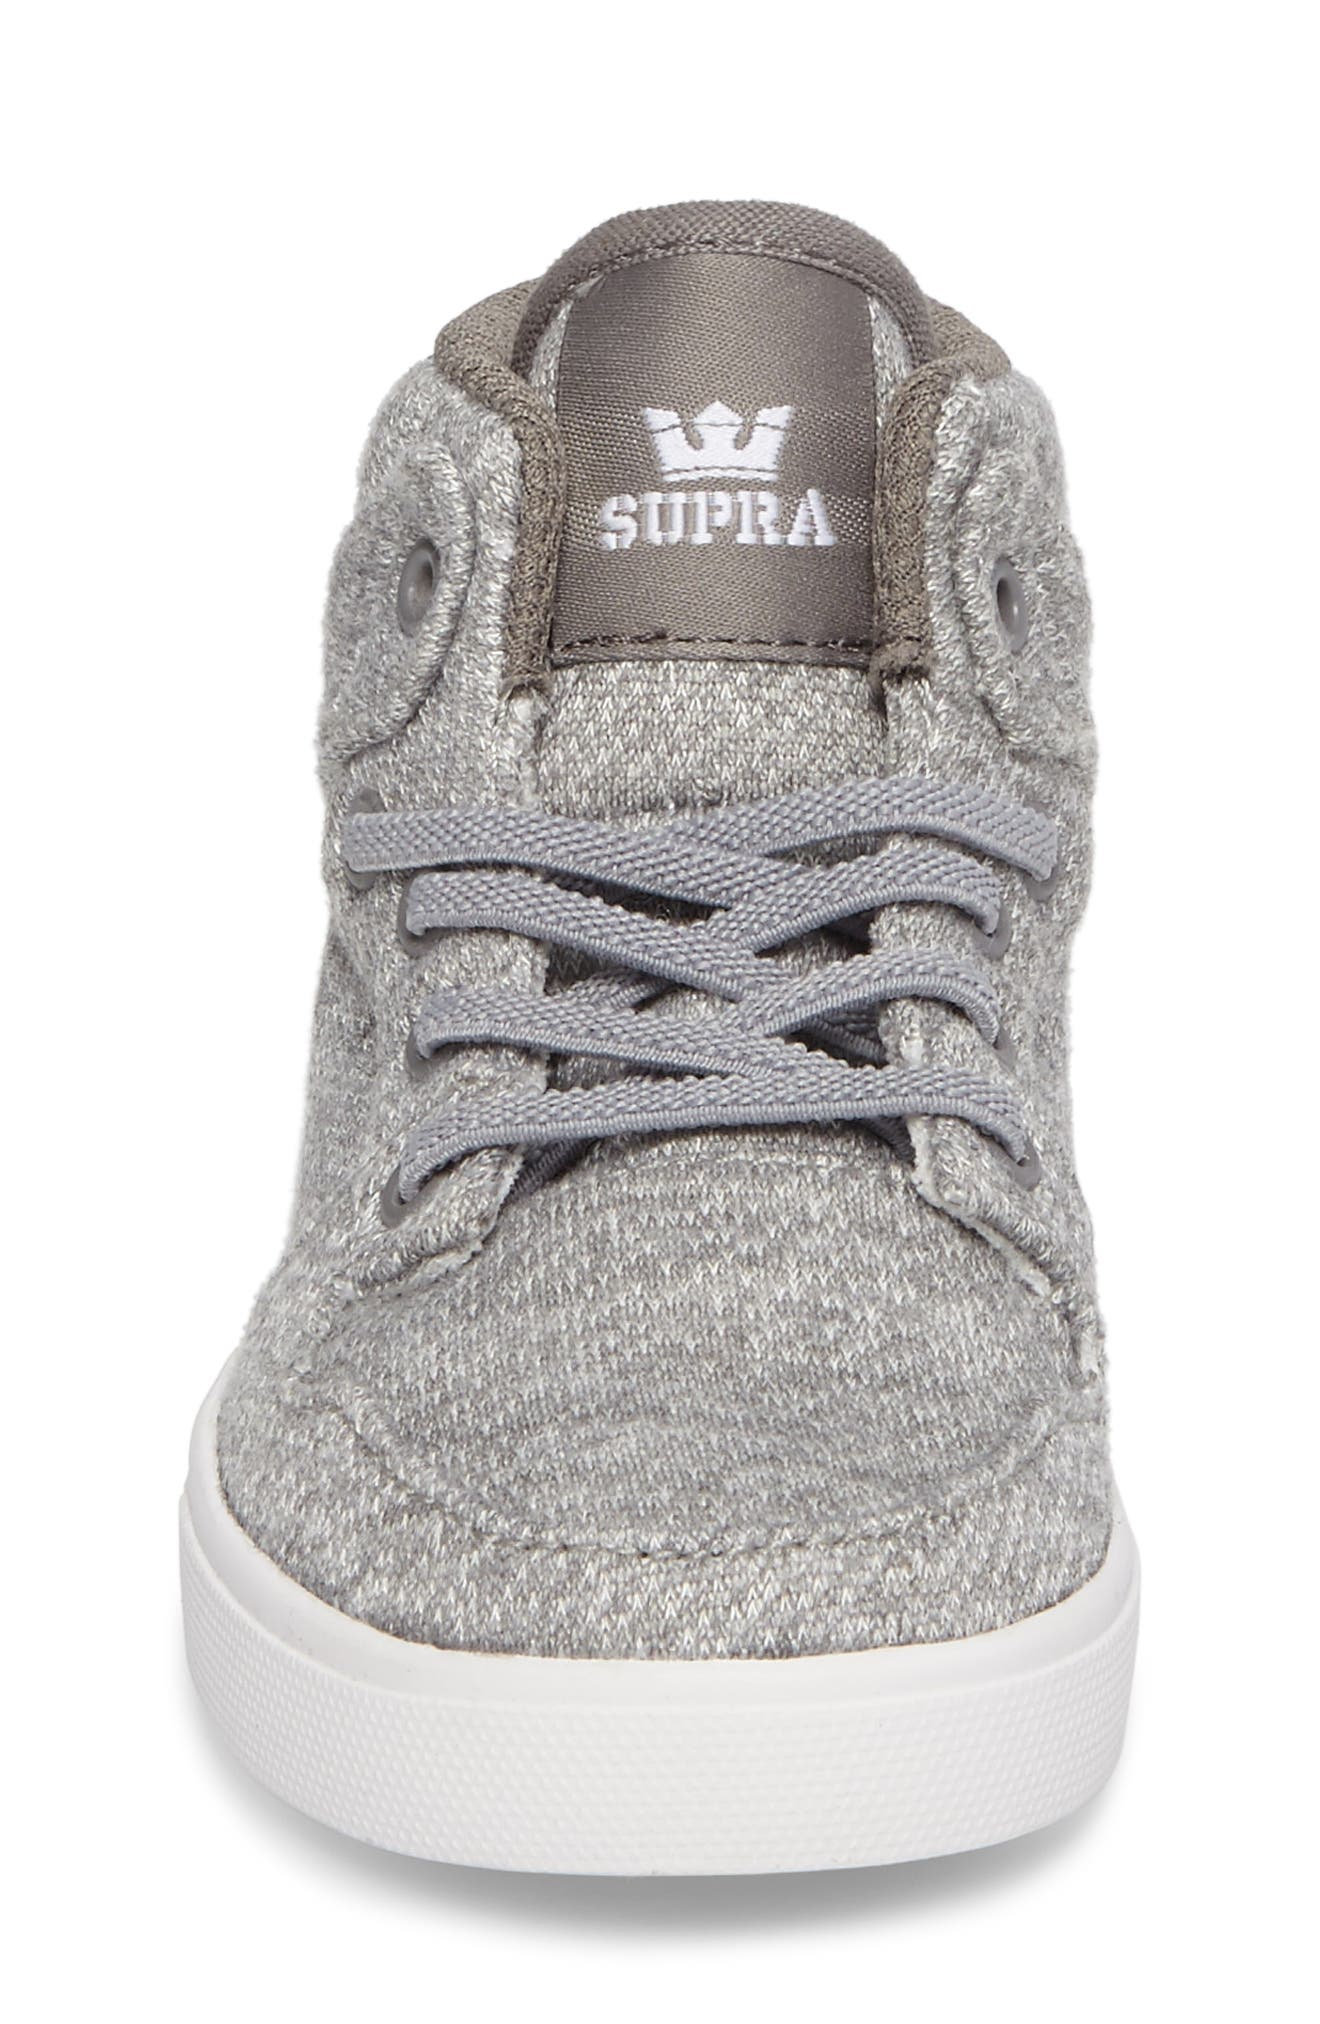 'Vaider' High Top Sneaker,                             Alternate thumbnail 3, color,                             Silver